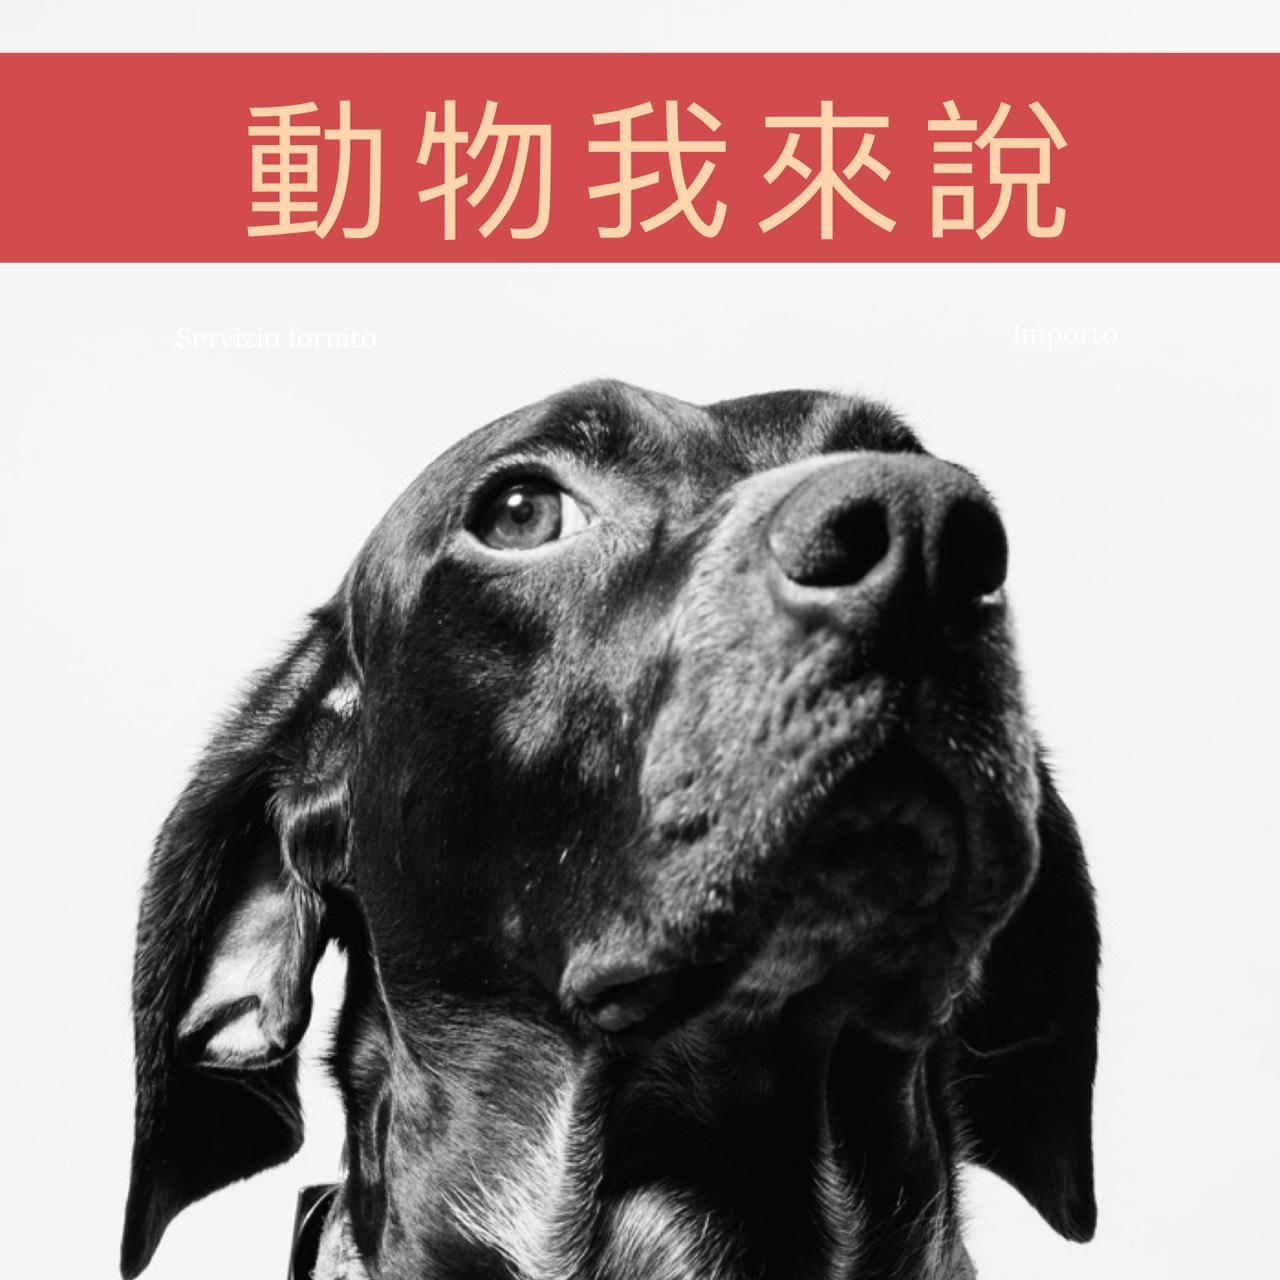 Ep23—動物我來說系列《你需要明白的安寧照護與安樂死》